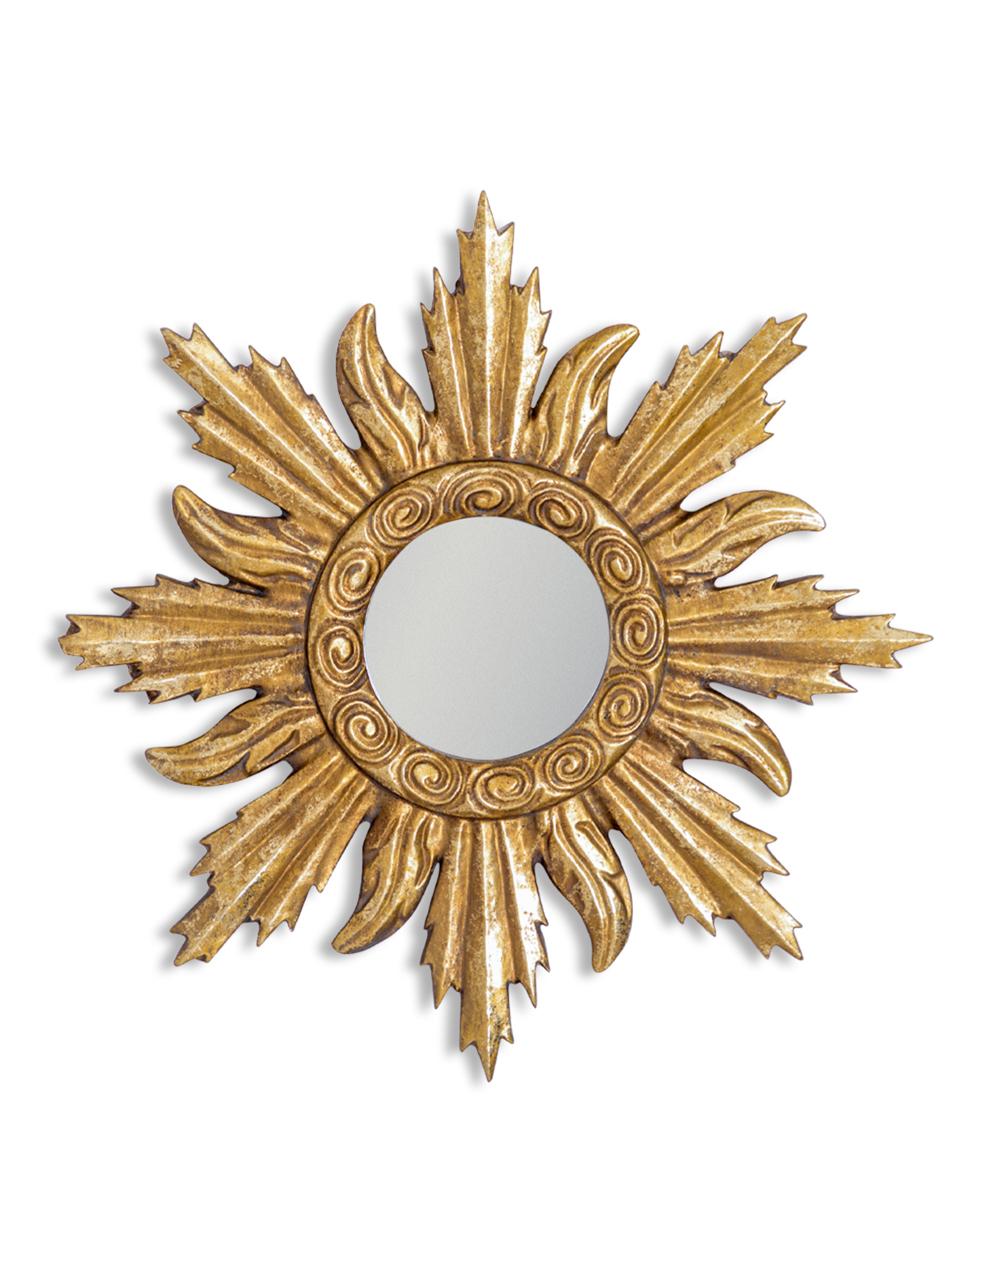 Antique Gold Star/Sun Convex Mirror